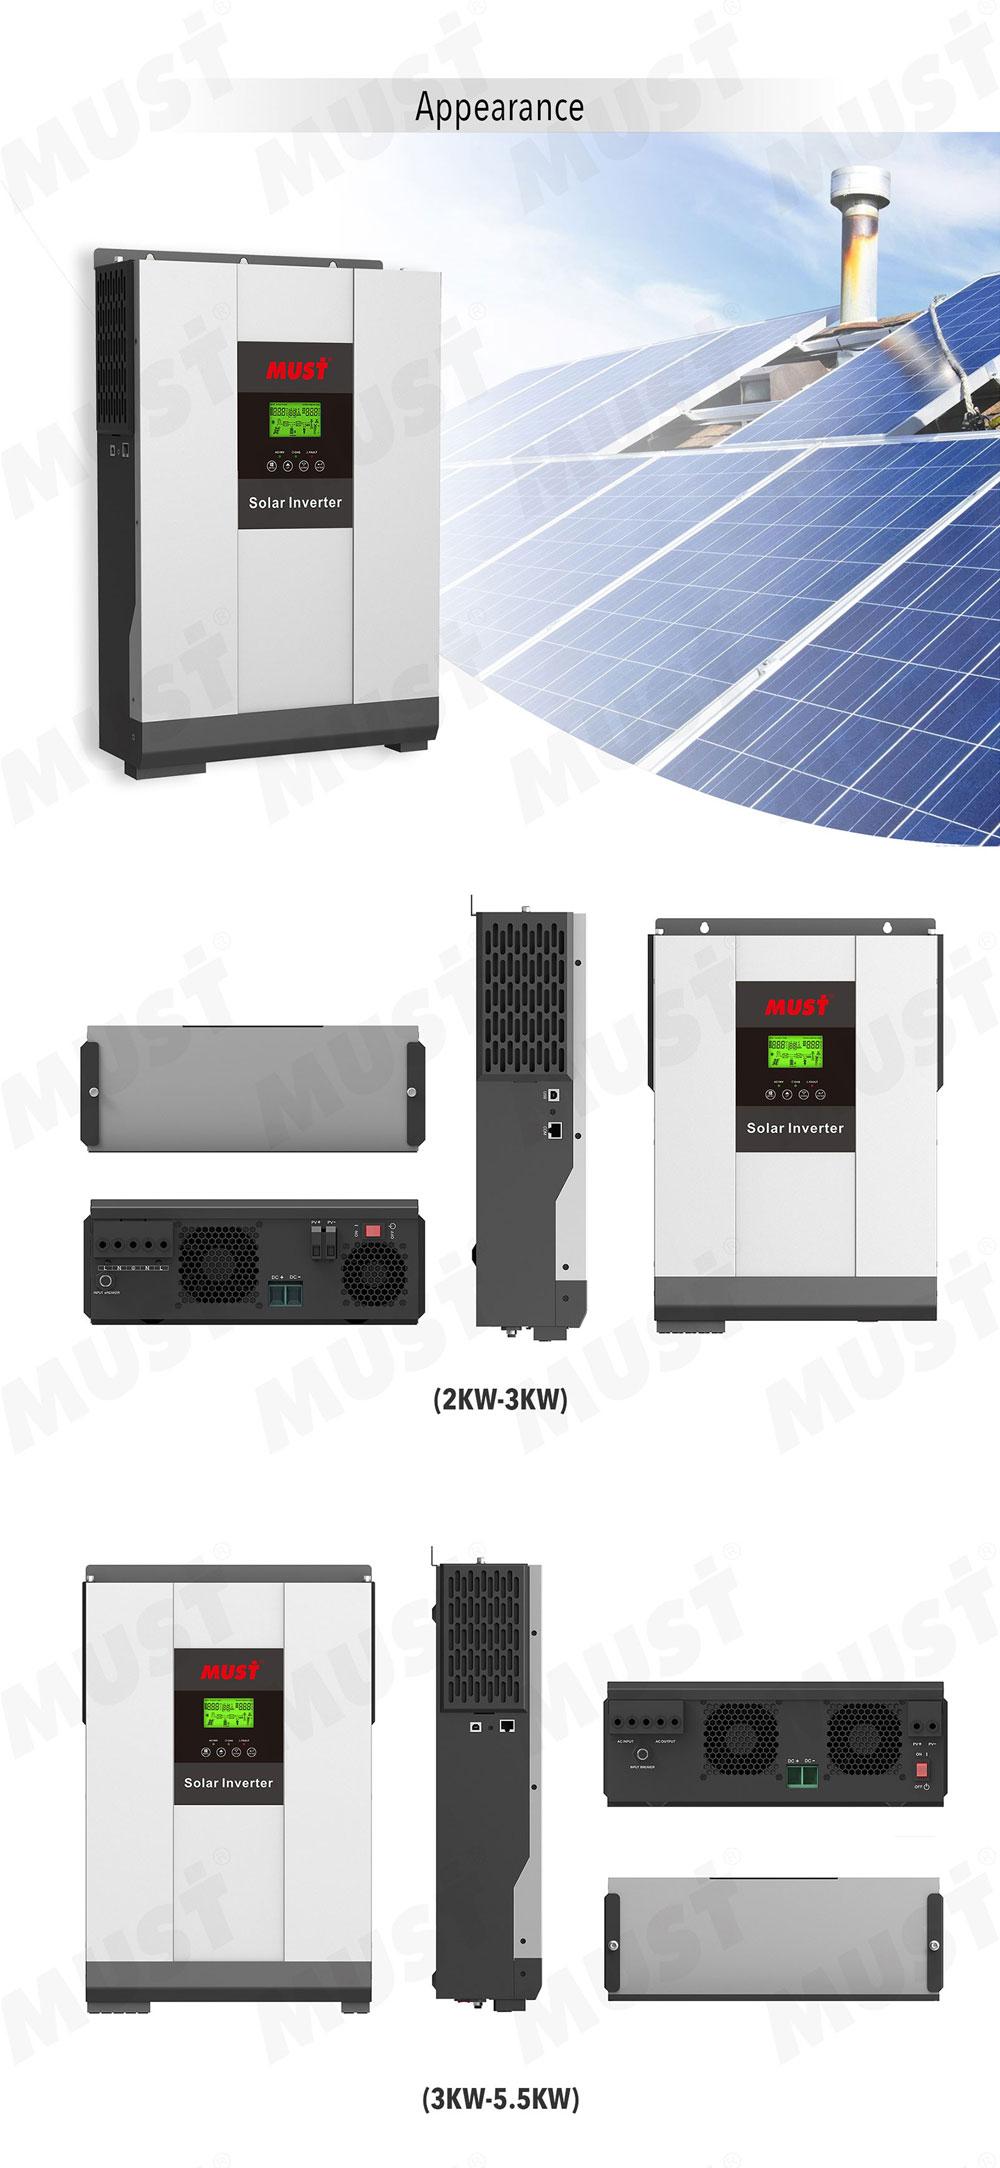 Harus PH1800 Seri Hibrida Tenaga Surya Inverter On/Off Grid Solar Energi Rumah Tangga Sistem 2kw 3kw 4kw 5kw 5.5kw Inverter